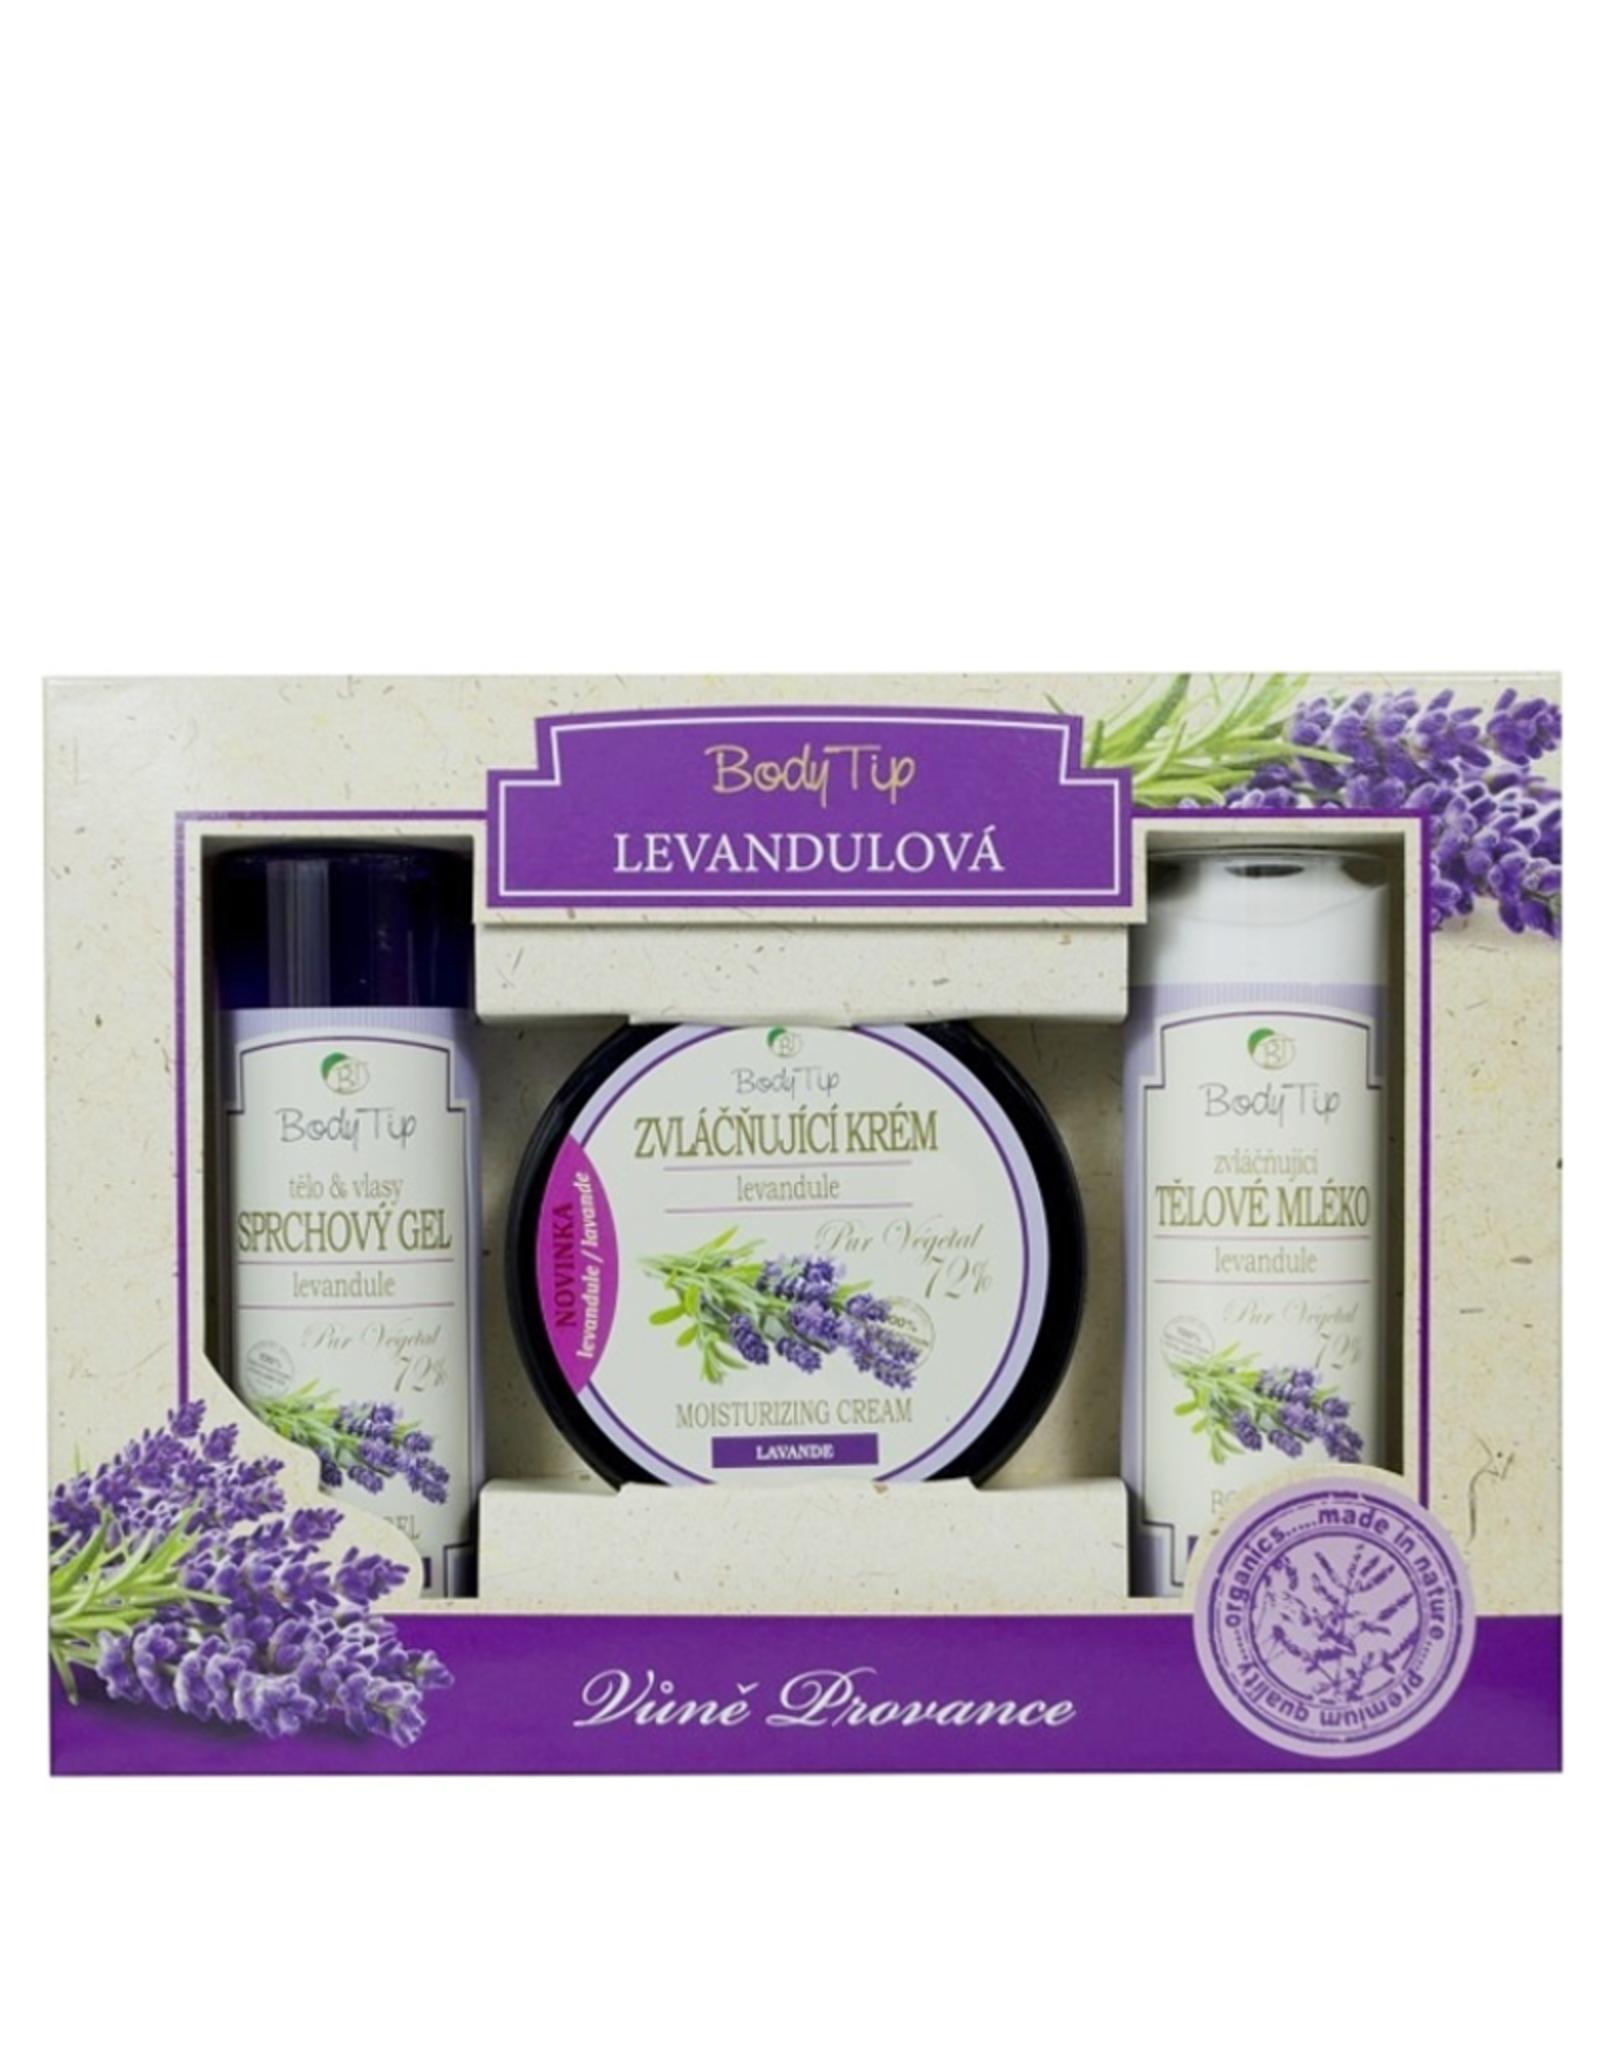 BODY TIP  Gift set met Lavendelolie